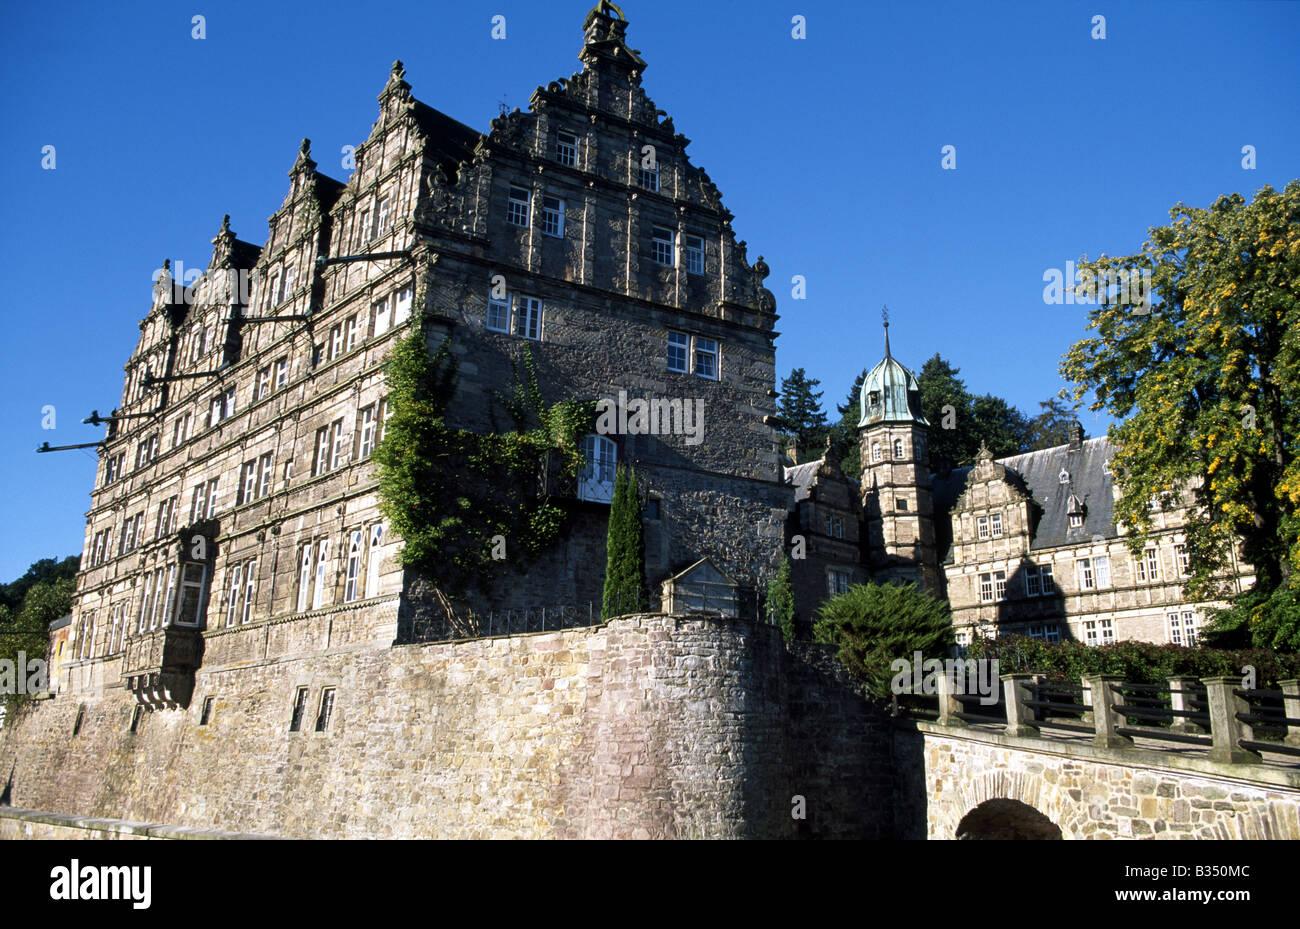 castle Haemelschenburg, Weser Hills, Lower Saxony, Germany Stock Photo